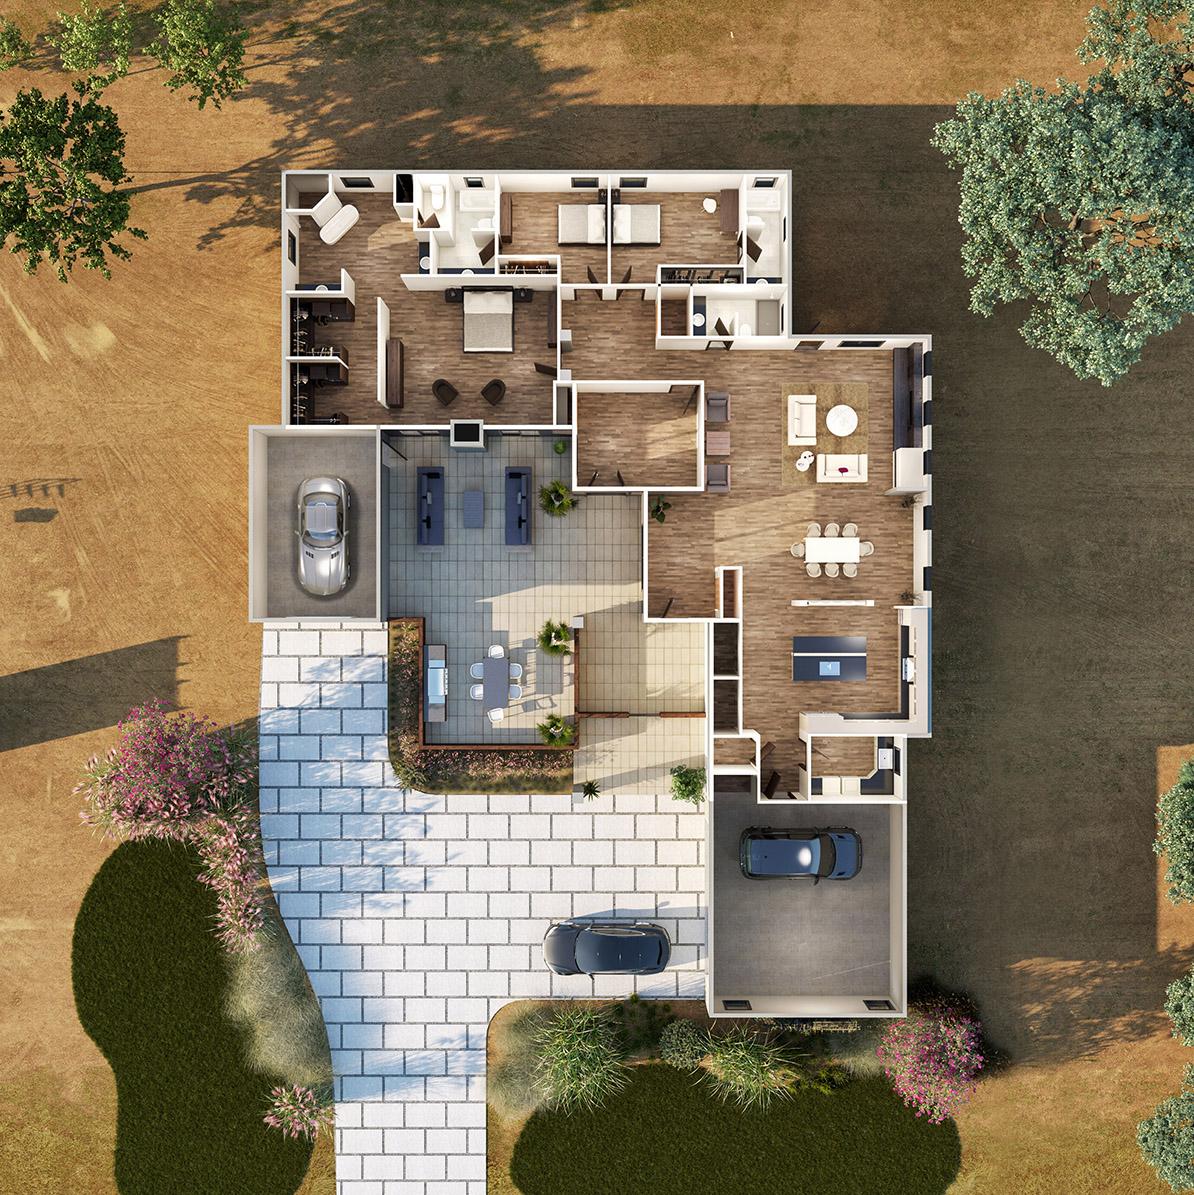 FLEX LONG floorplan.jpg